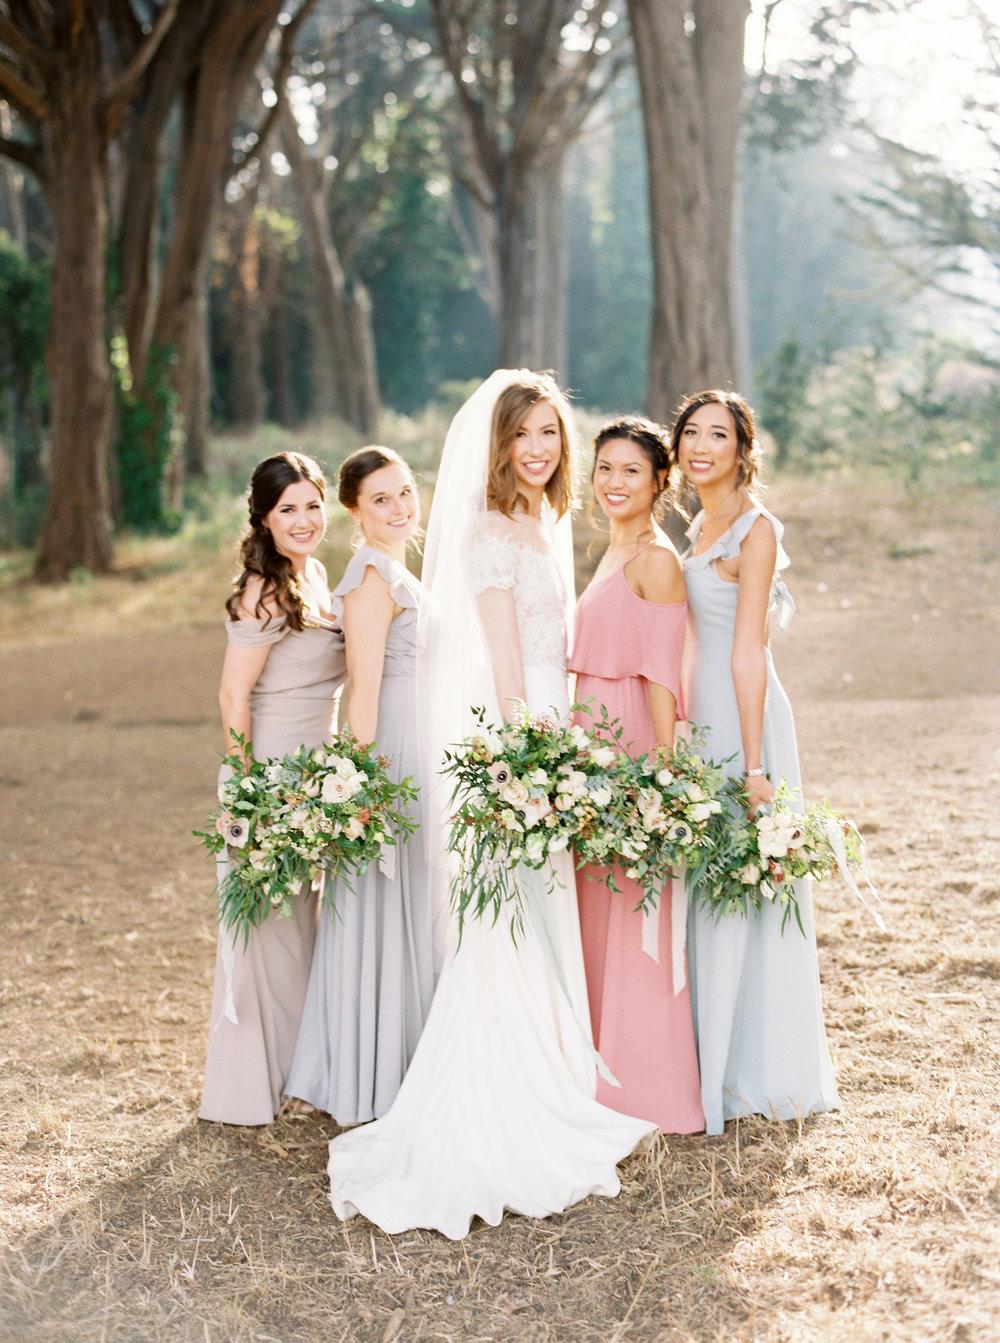 Log-cabin-wedding-in-presidio-san-francisco-california-desintation-wedding-photography-75.jpg